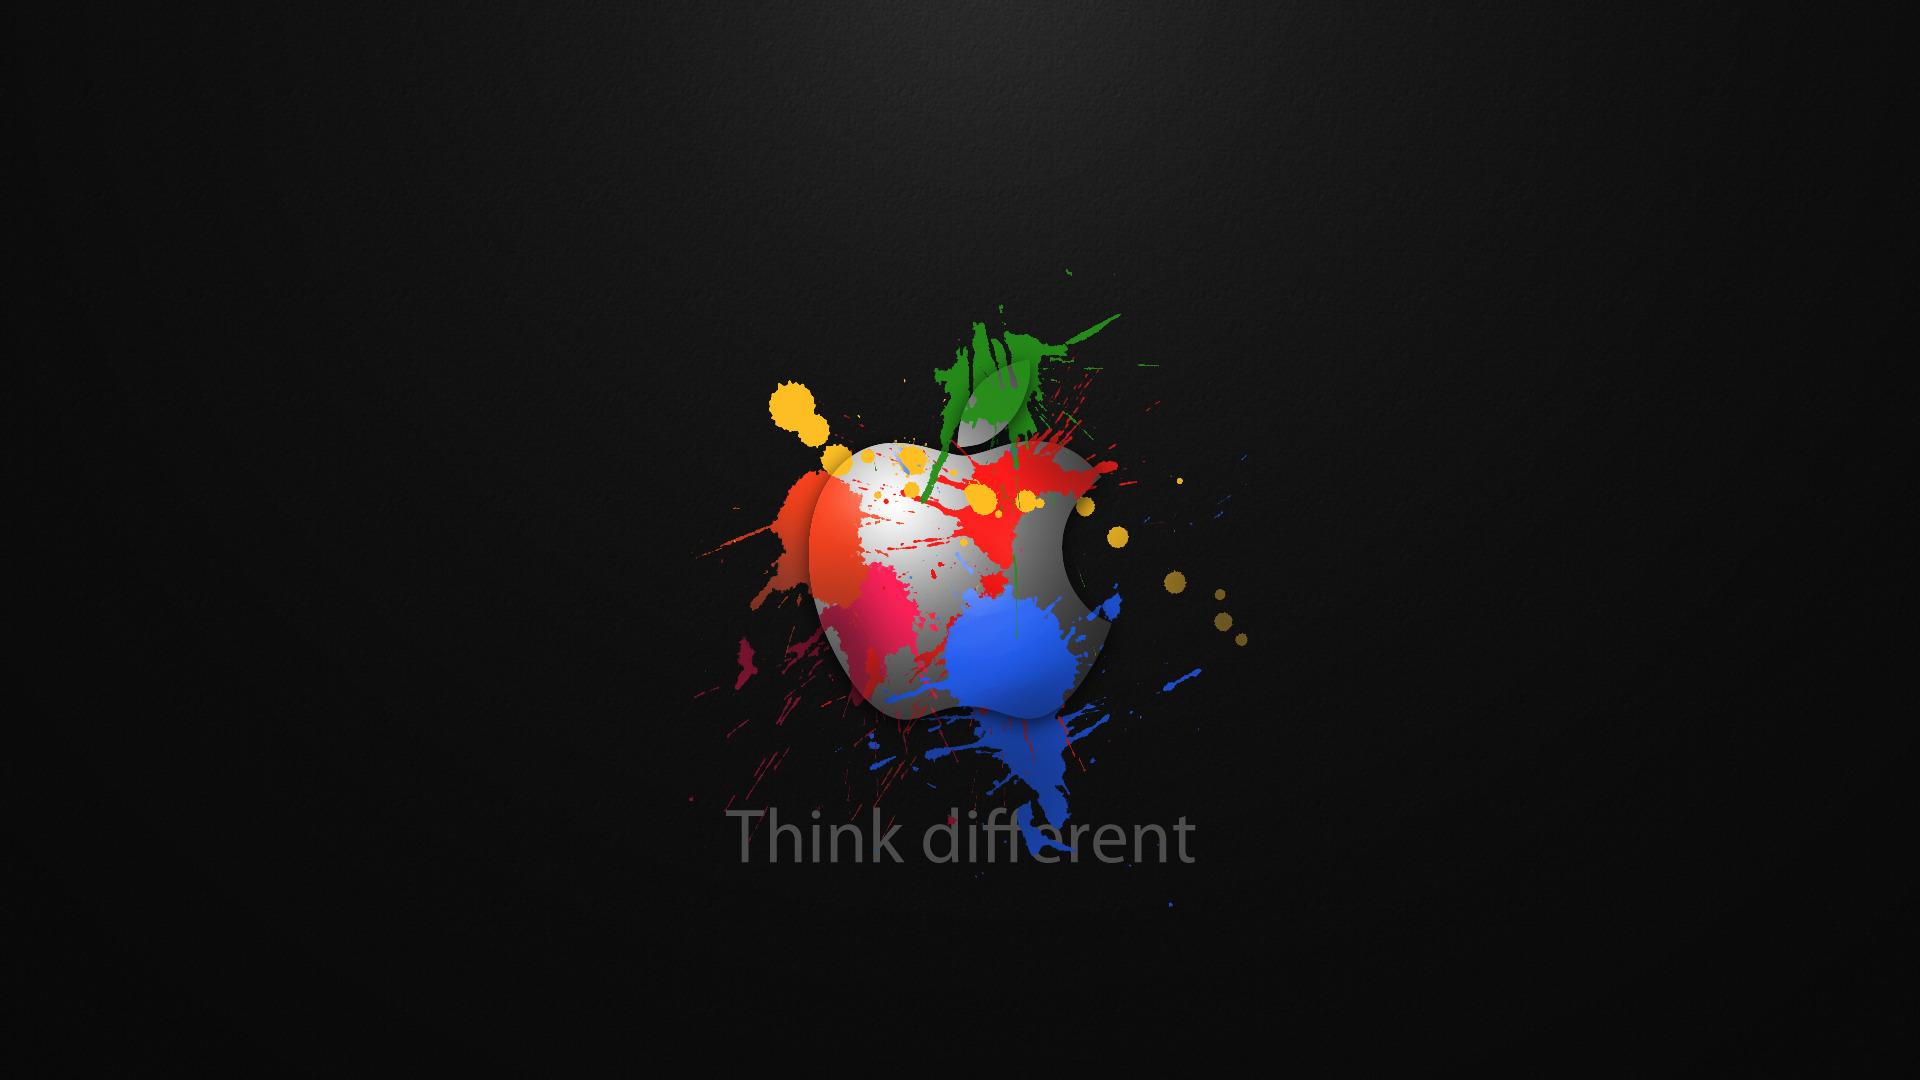 apple mac 8 1920x1080jpg 1920x1080